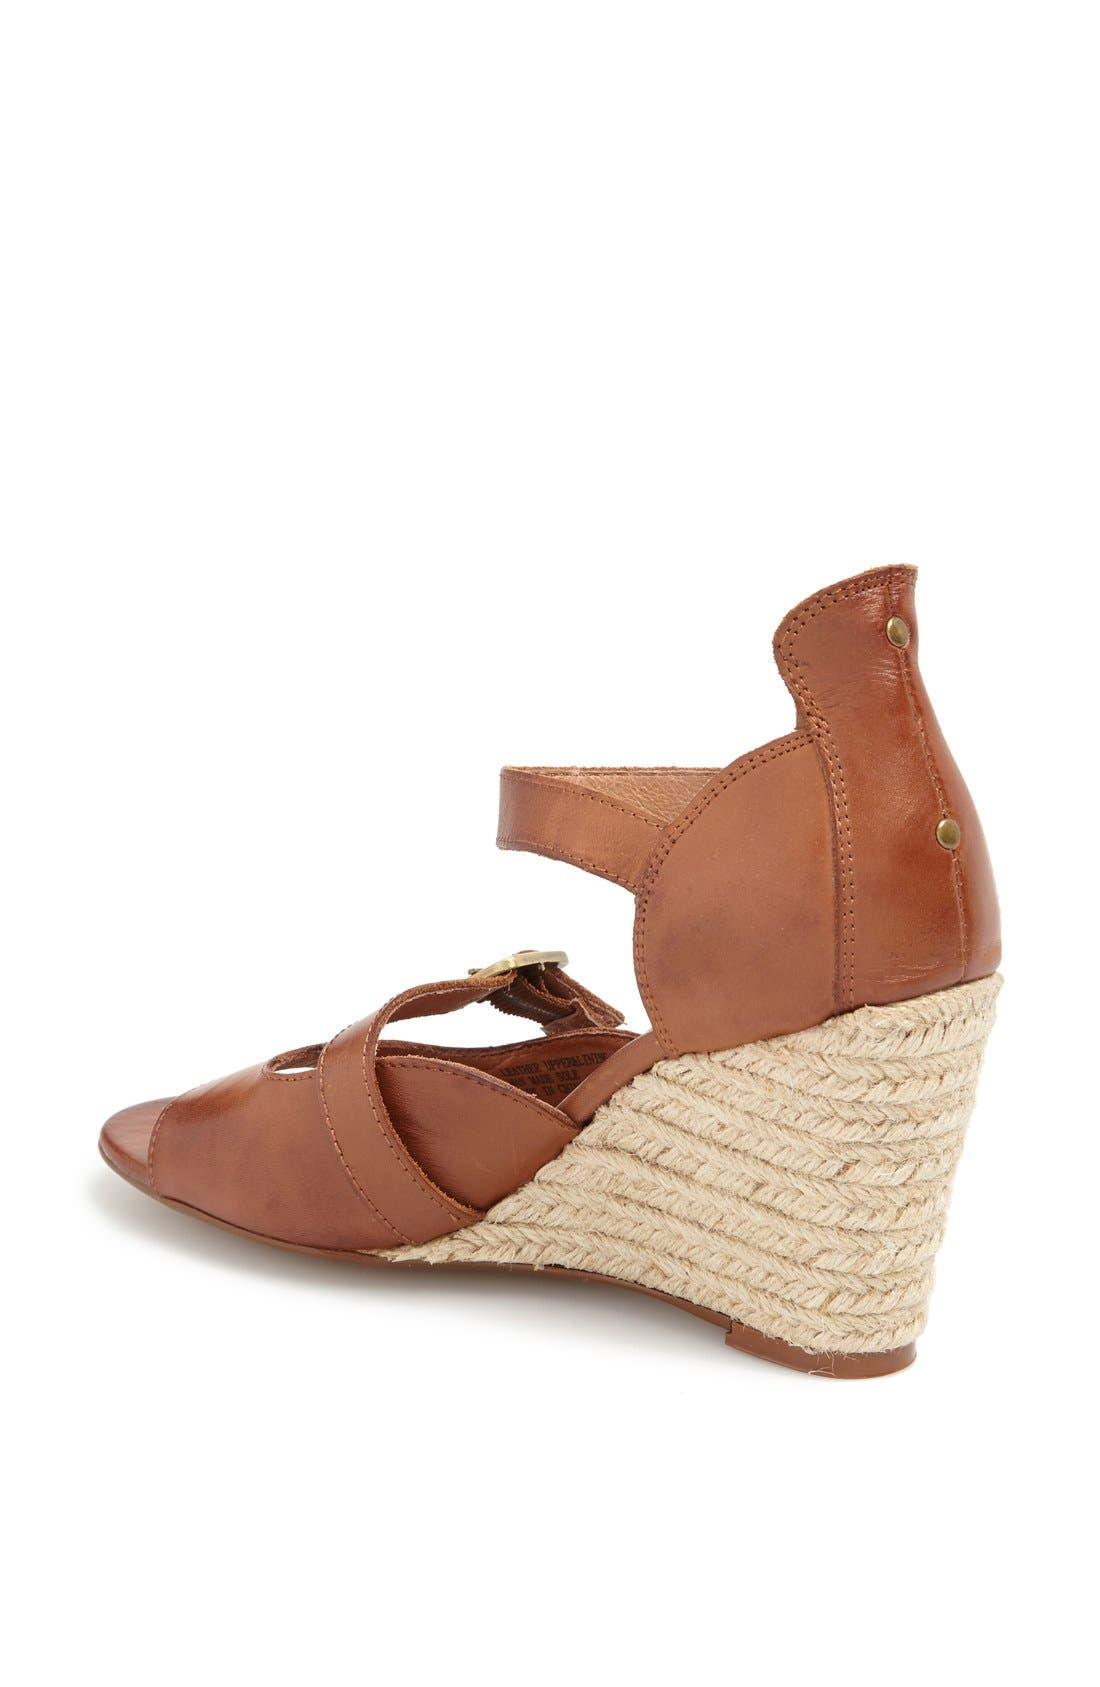 Alternate Image 2  - Corso Como 'Hello' Calfskin Leather Sandal